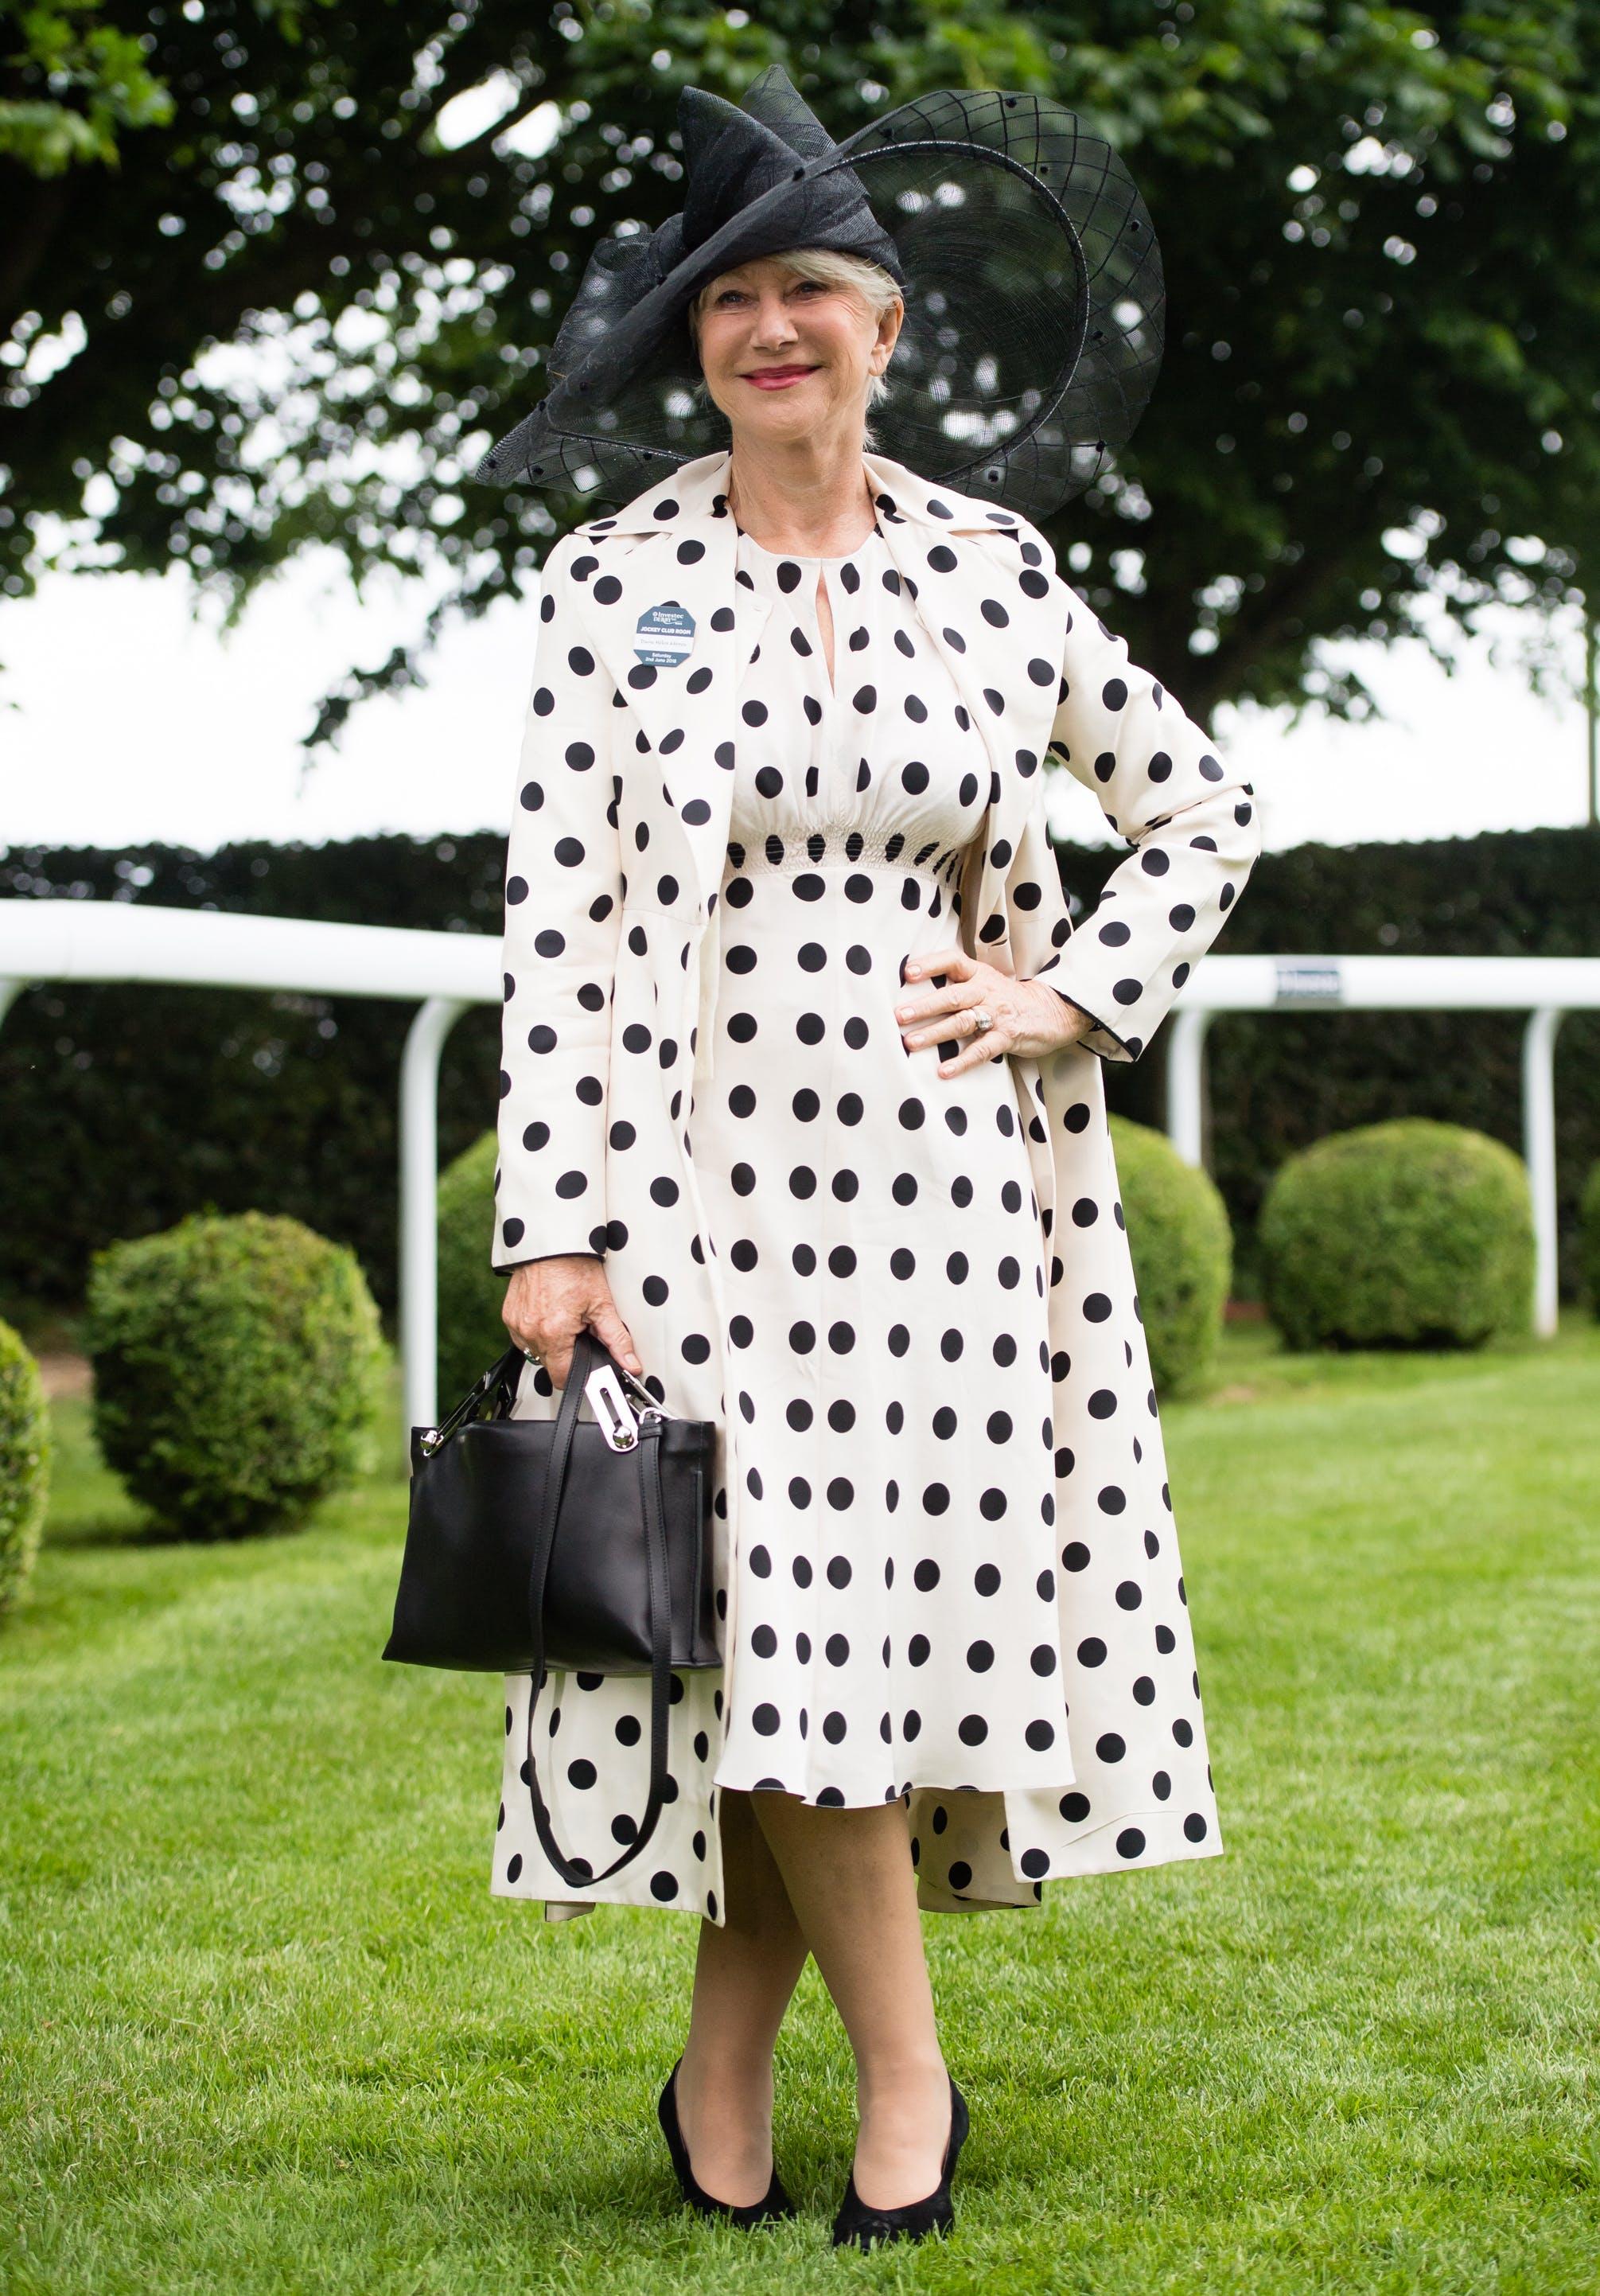 e15631f20c6 Helen Mirren wearing a polka dot coat and matching dress